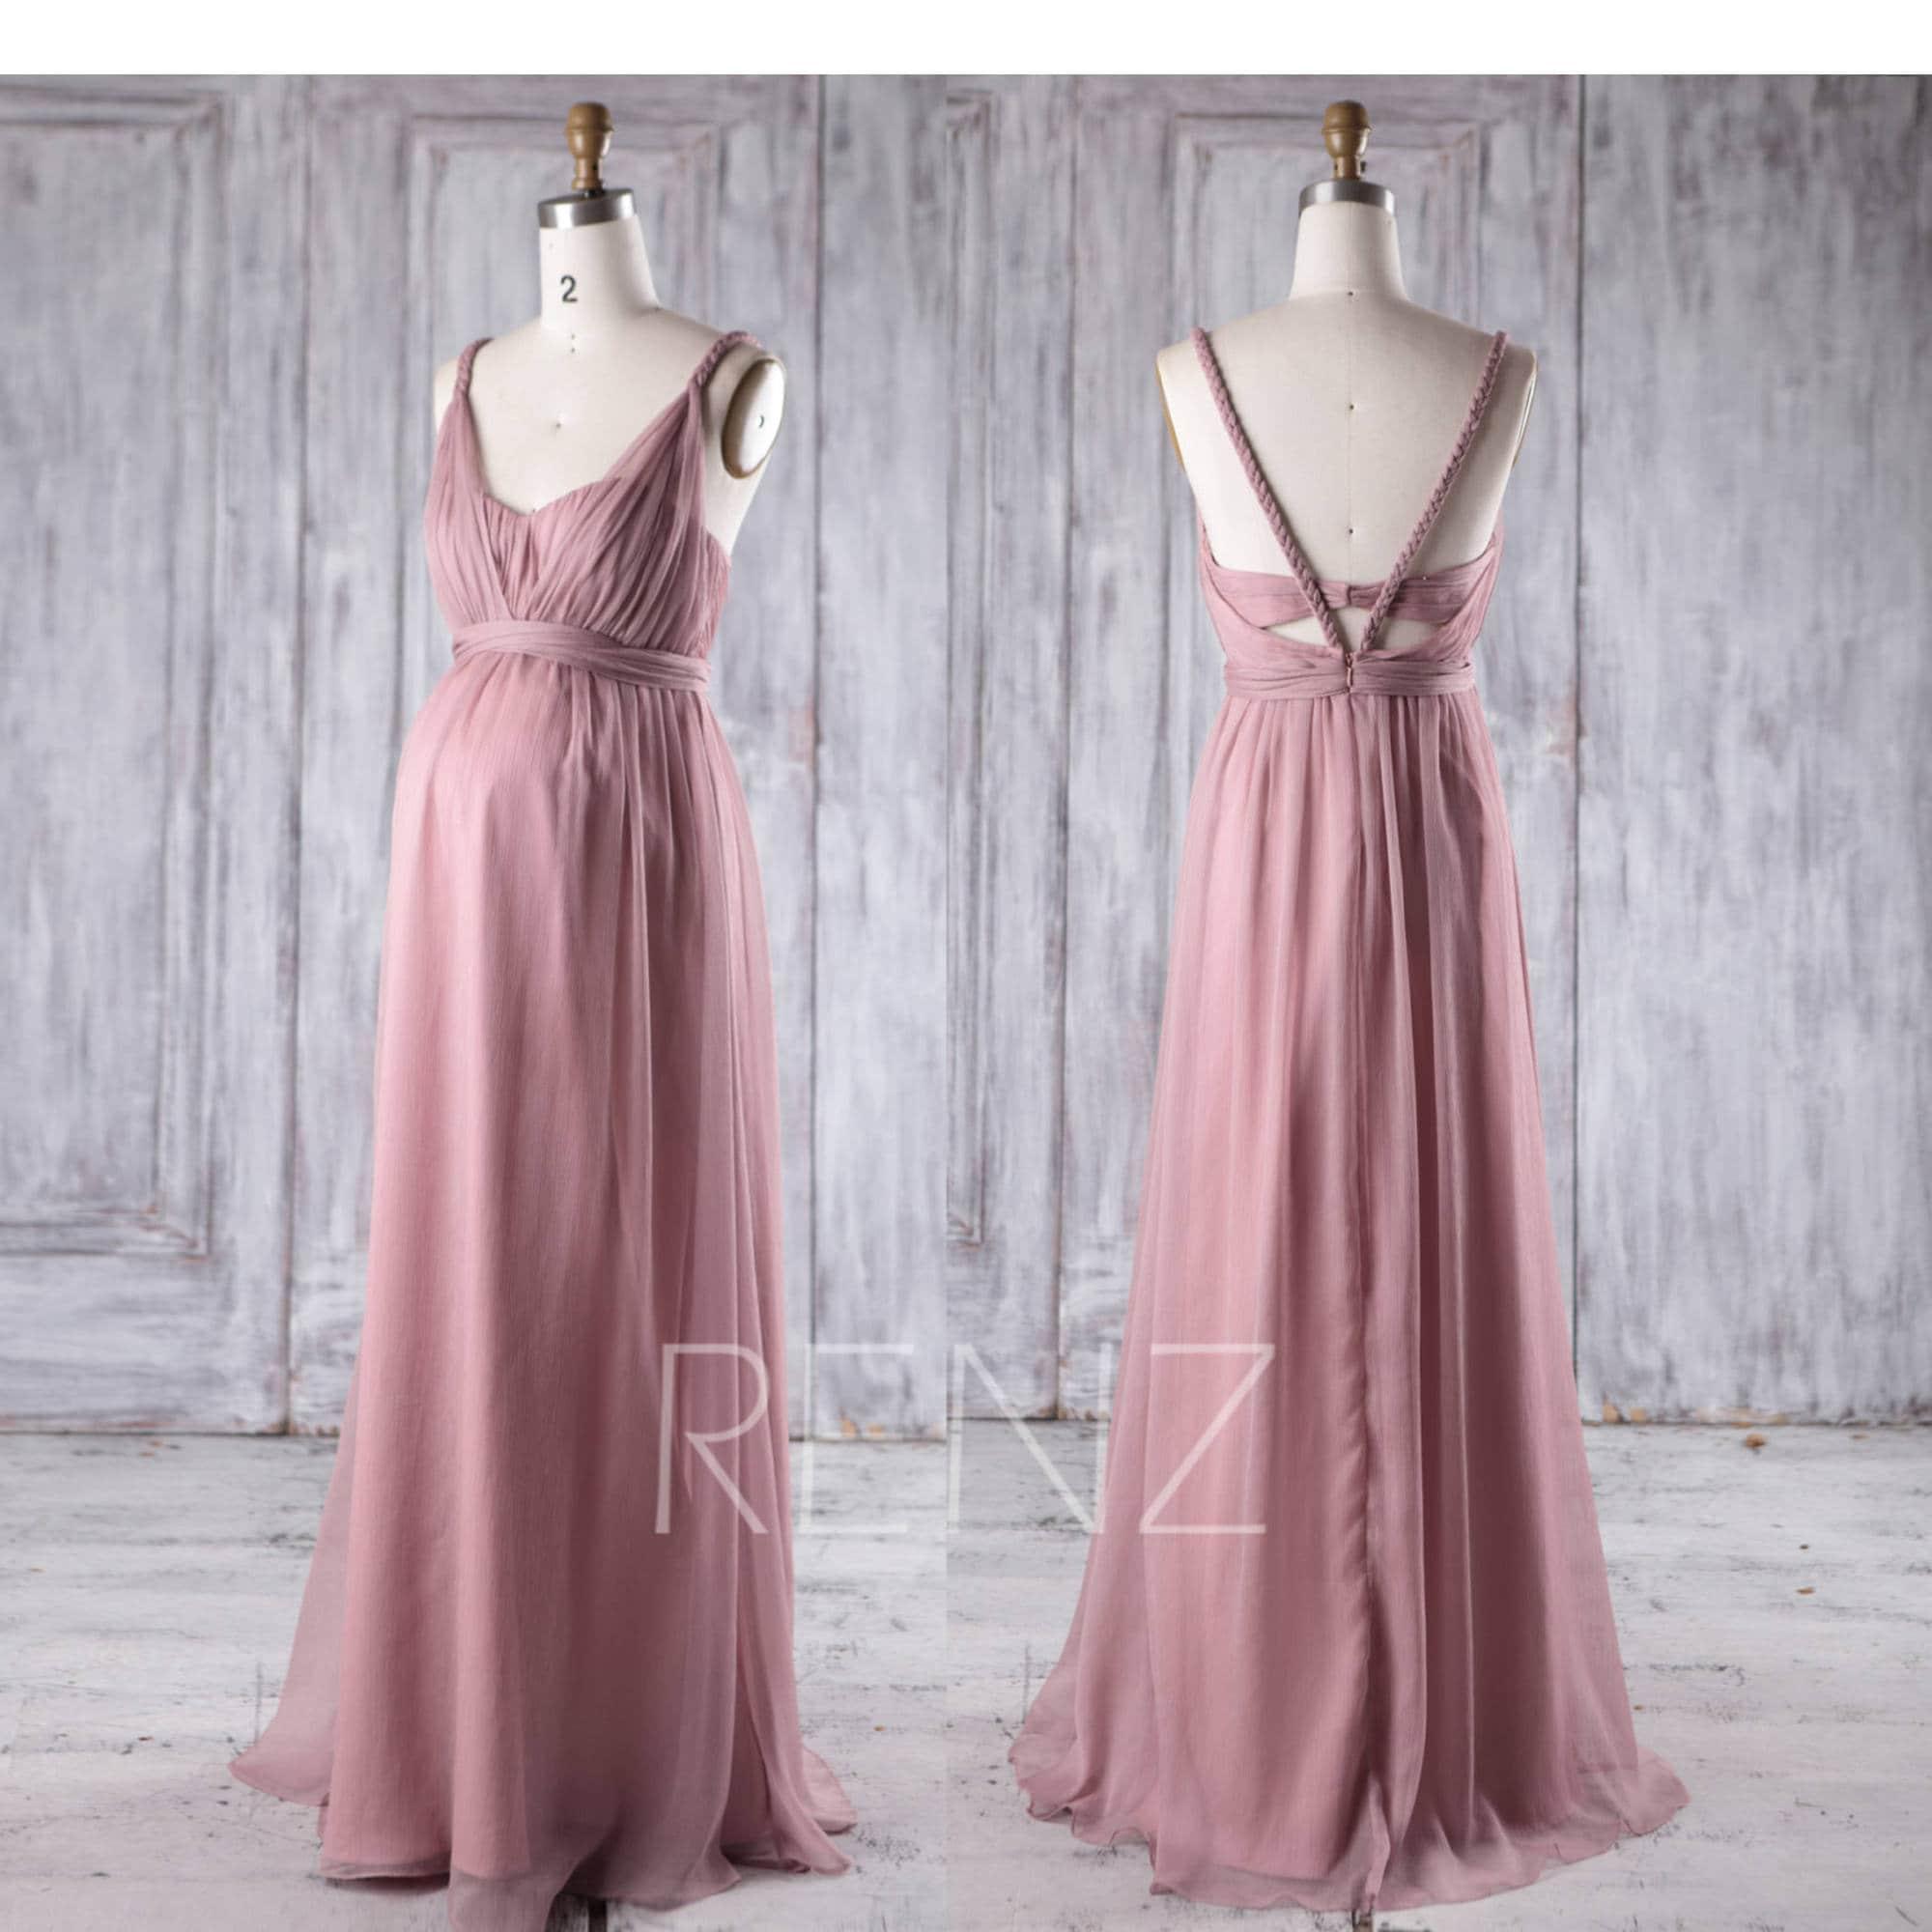 Maternity bridesmaid dress dusty rose chiffon wedding dress zoom ombrellifo Gallery